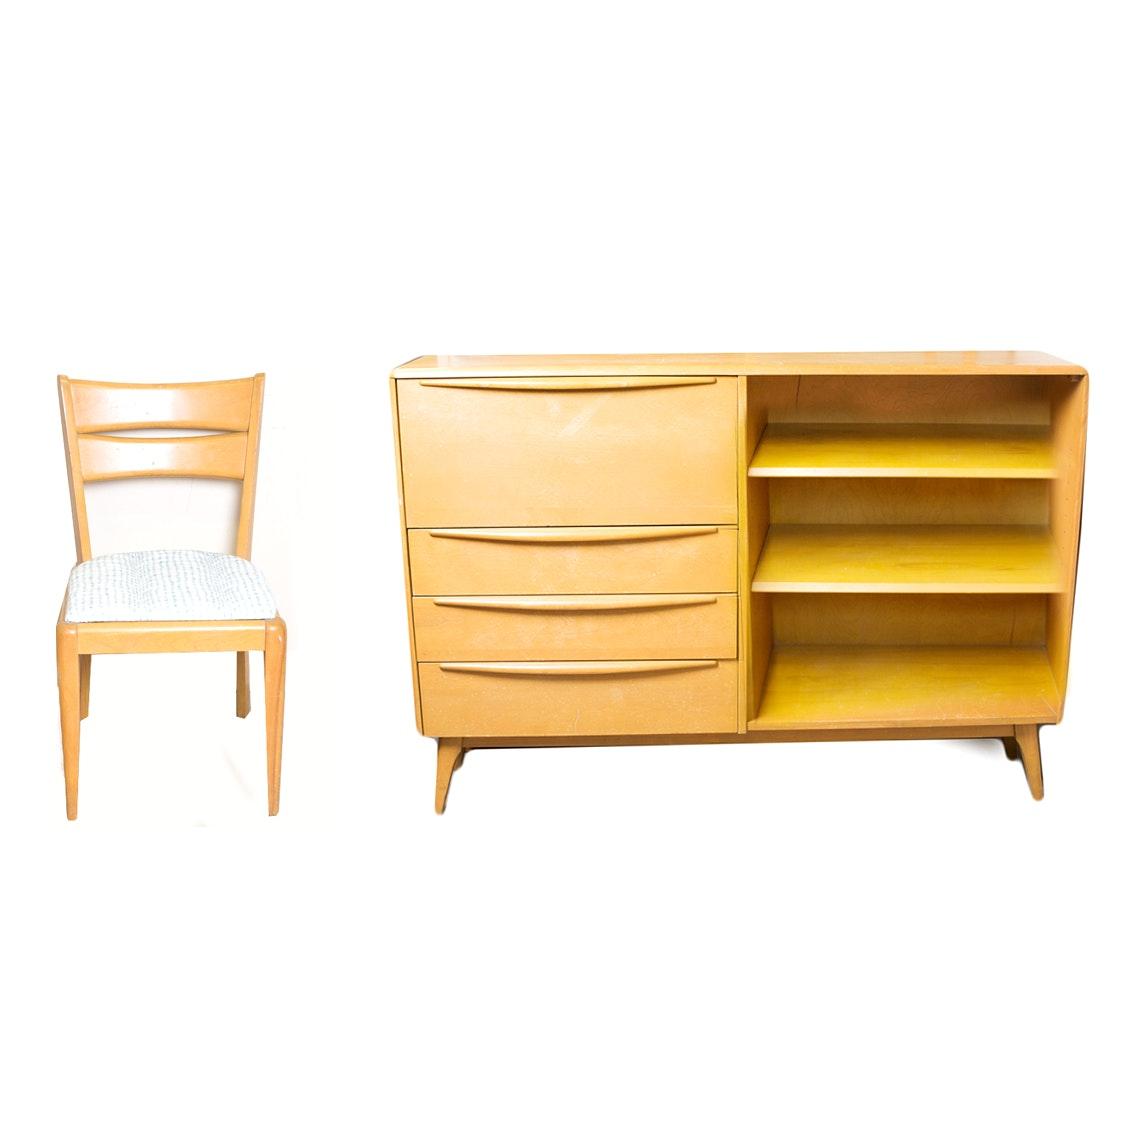 Heywood Wakefield Mid Century Desk, Shelf, Drawer Combo